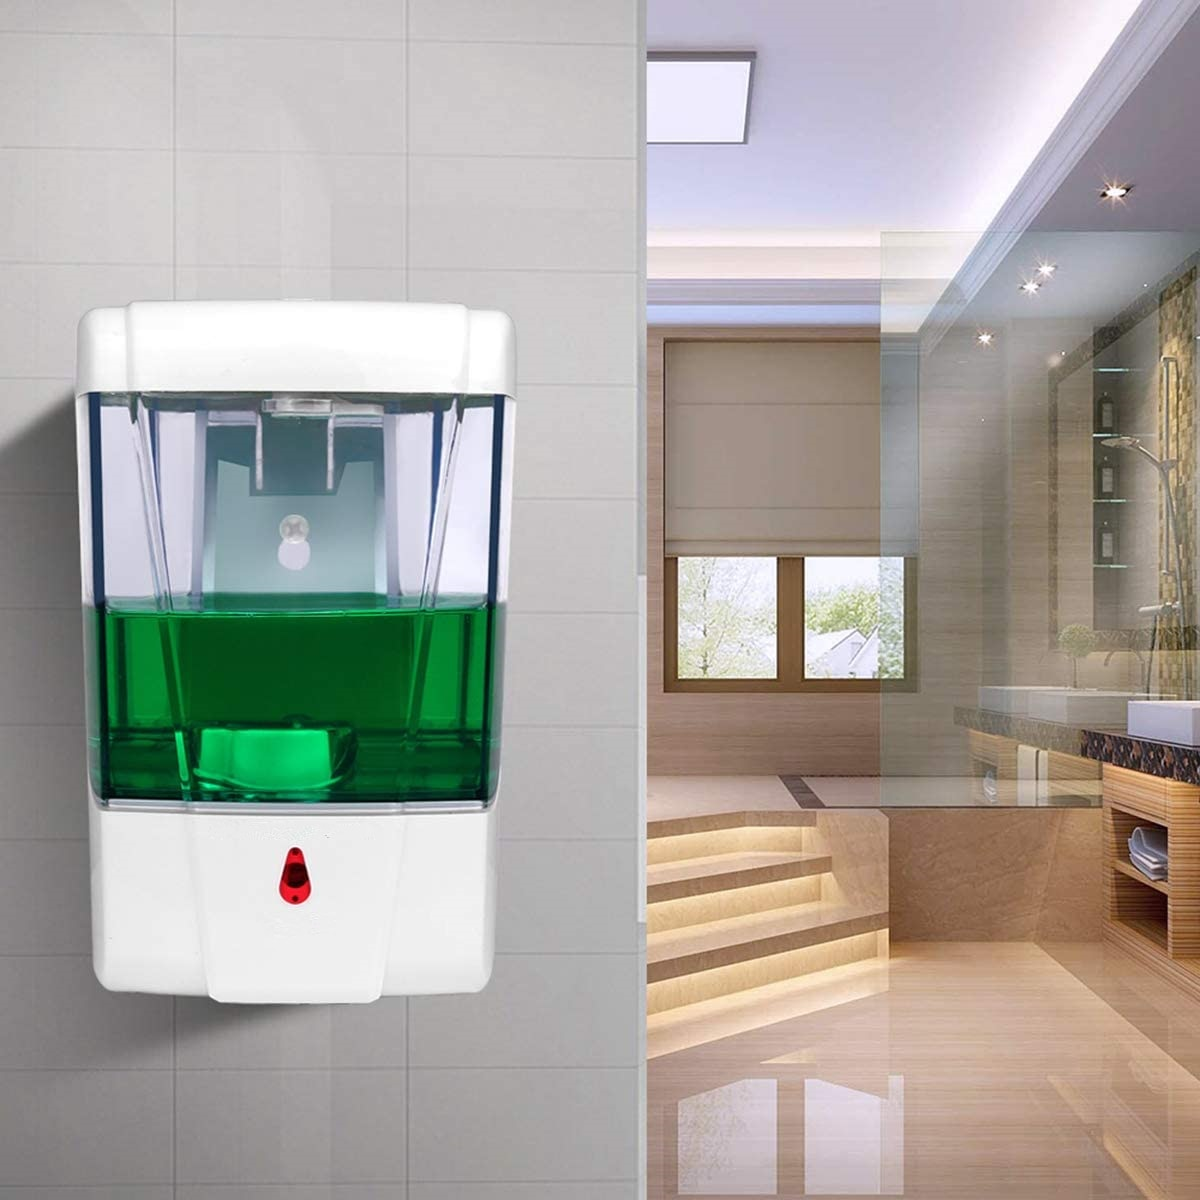 Liquid Soap Dispenser 700ml Wall-Mount Automatic Soap Dispenser Intelligent Touchless Sensor Hand Washer For Bathroom Equipment enlarge